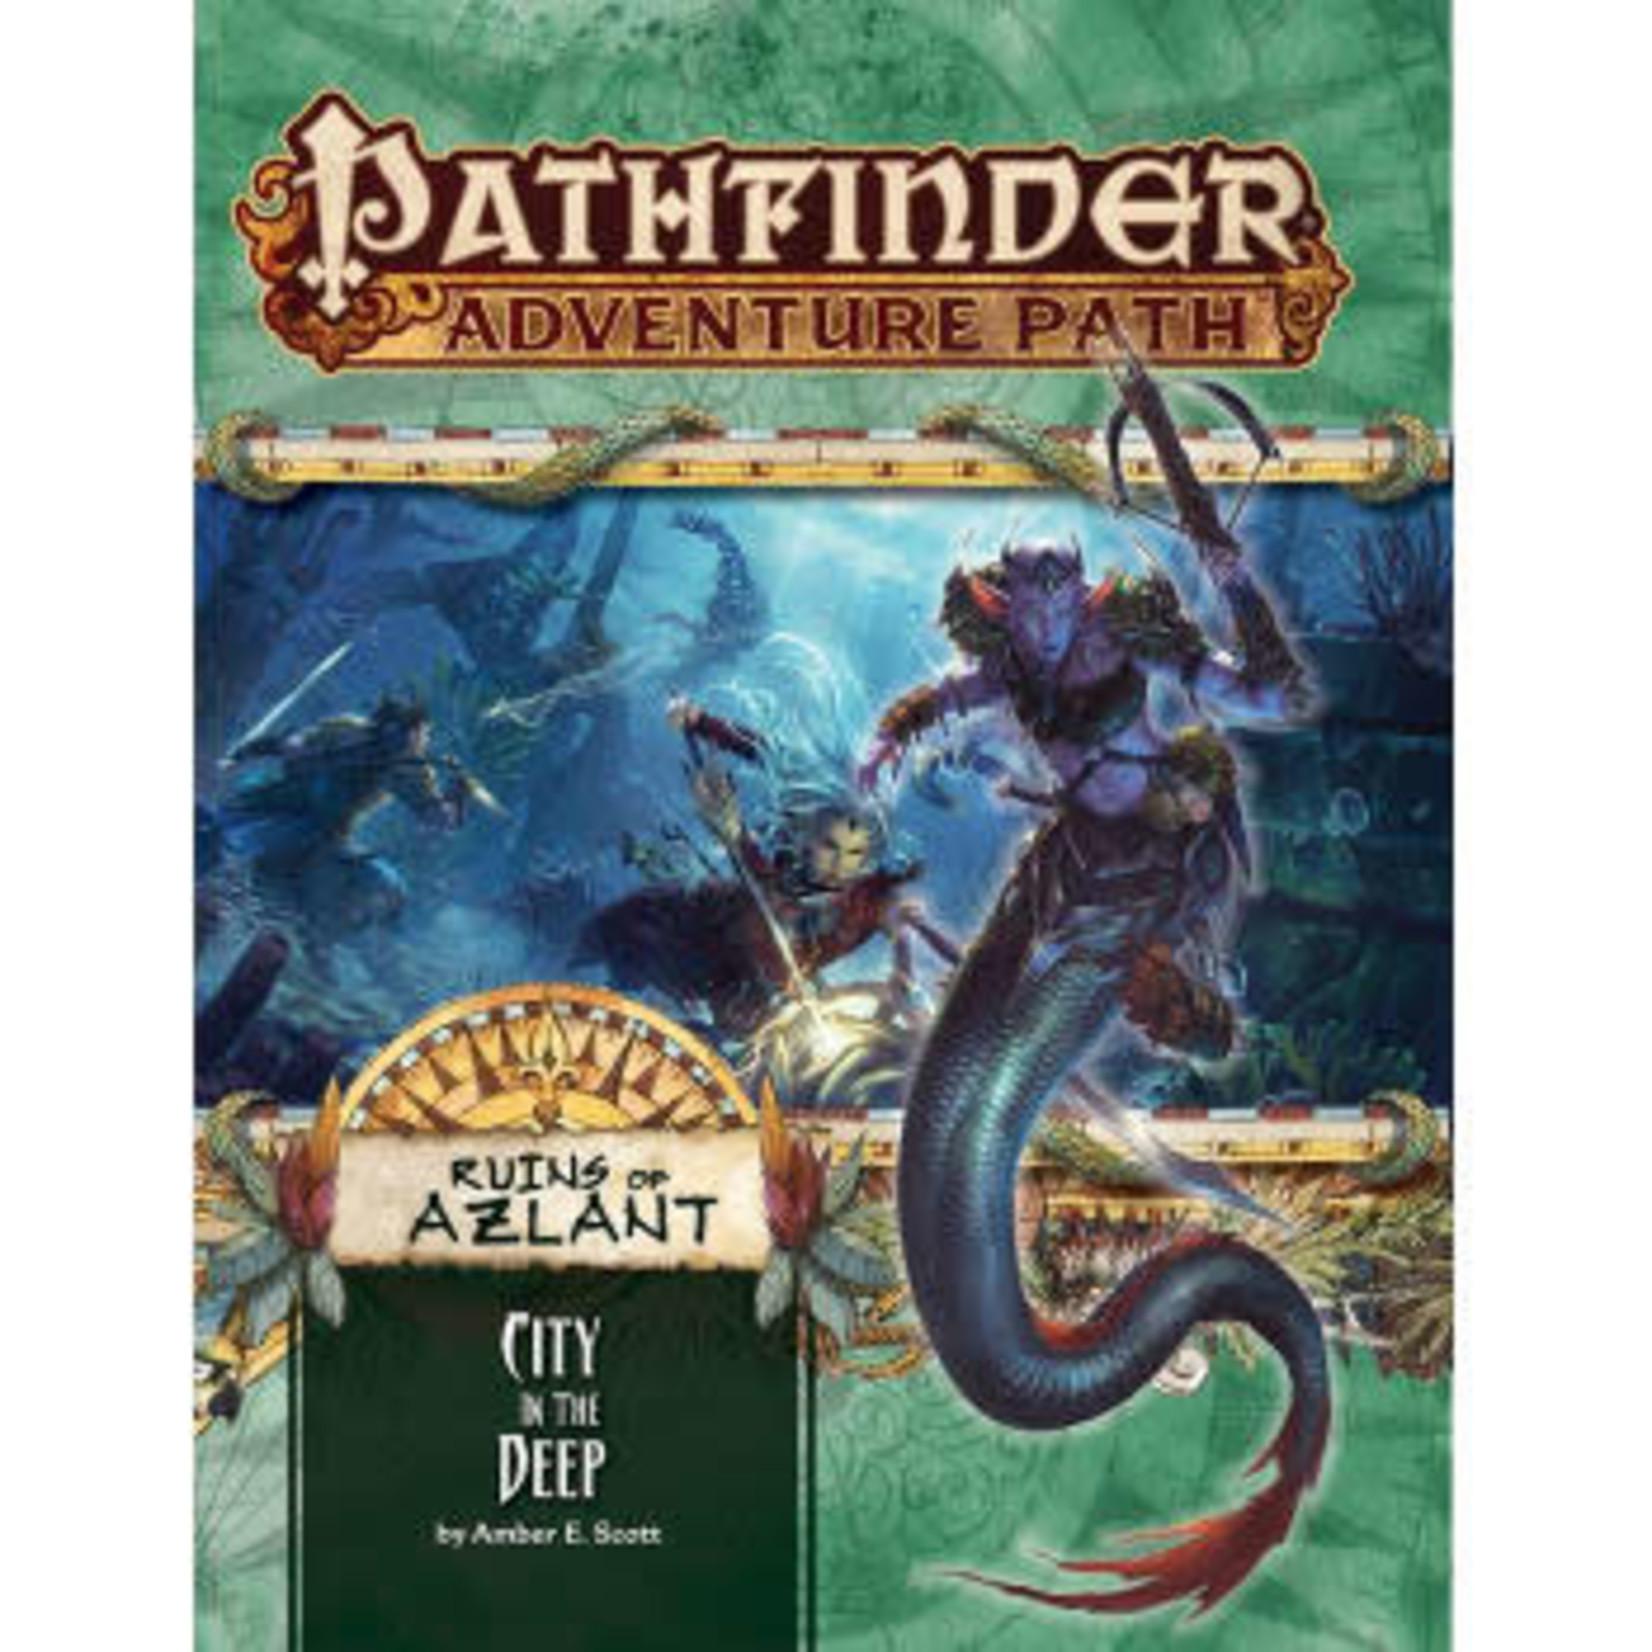 Pathfinder Adventure Path: Ruins of Azlant 4 City in the Deep